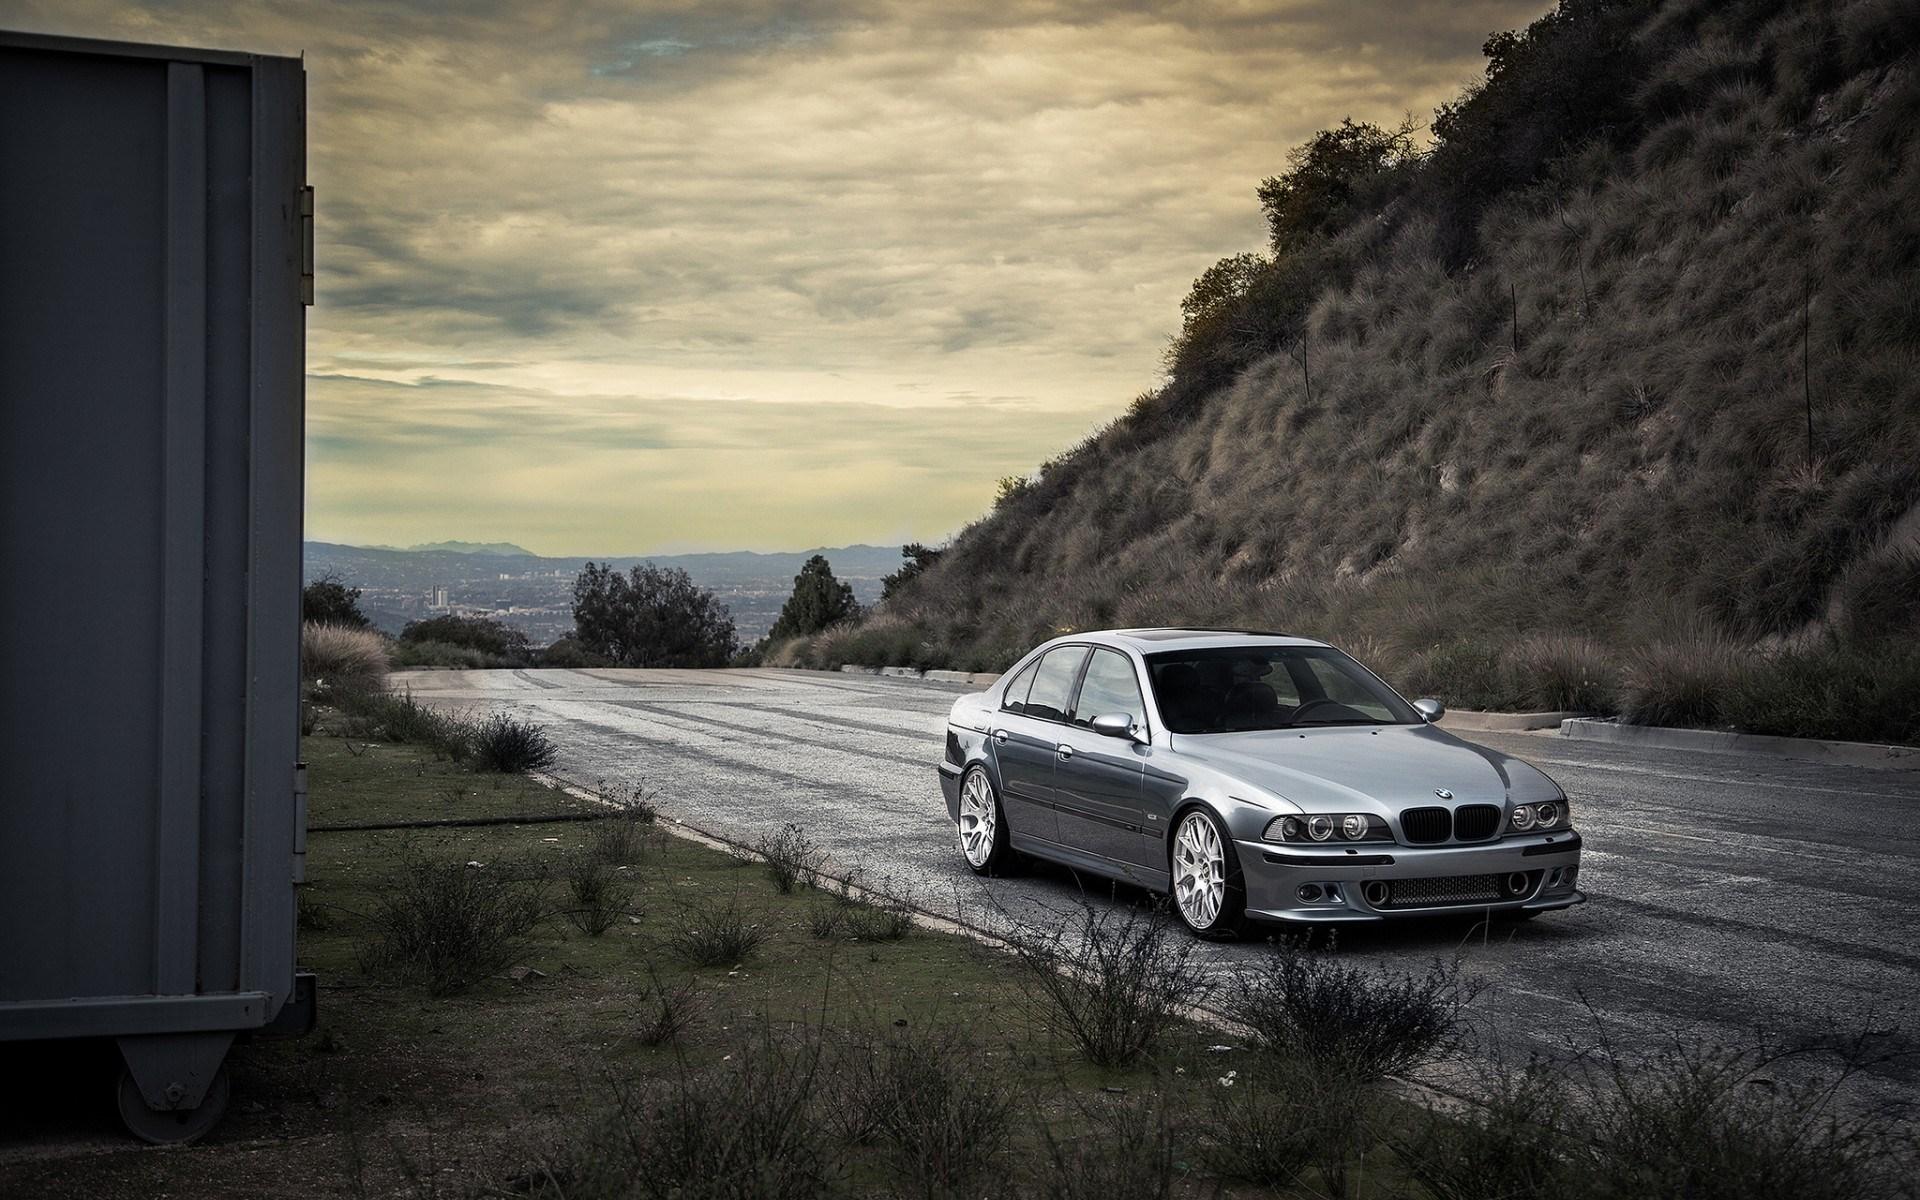 BMW M5 HD Wallpaper Background Image 1920x1200 ID447685 1920x1200